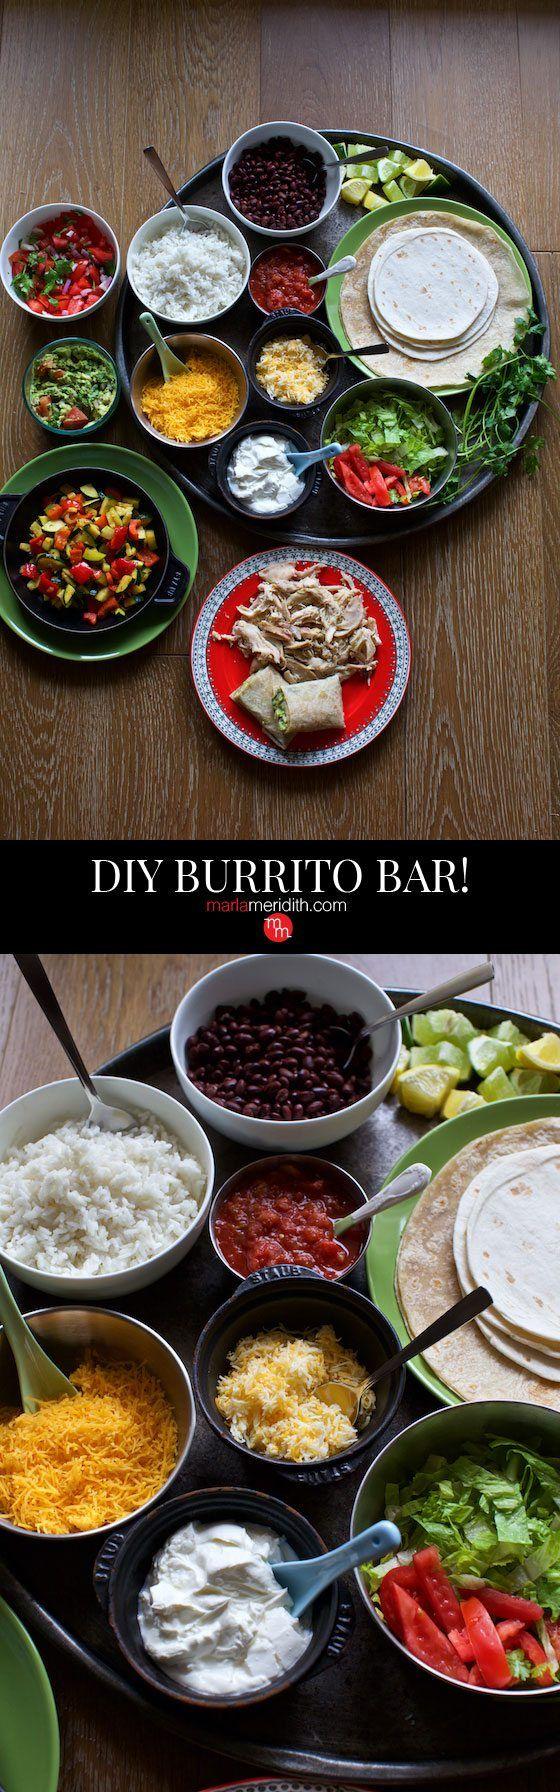 DIY Burrito Bar   Pinterest   Mexikanisches buffet, Mexikanisch und ...